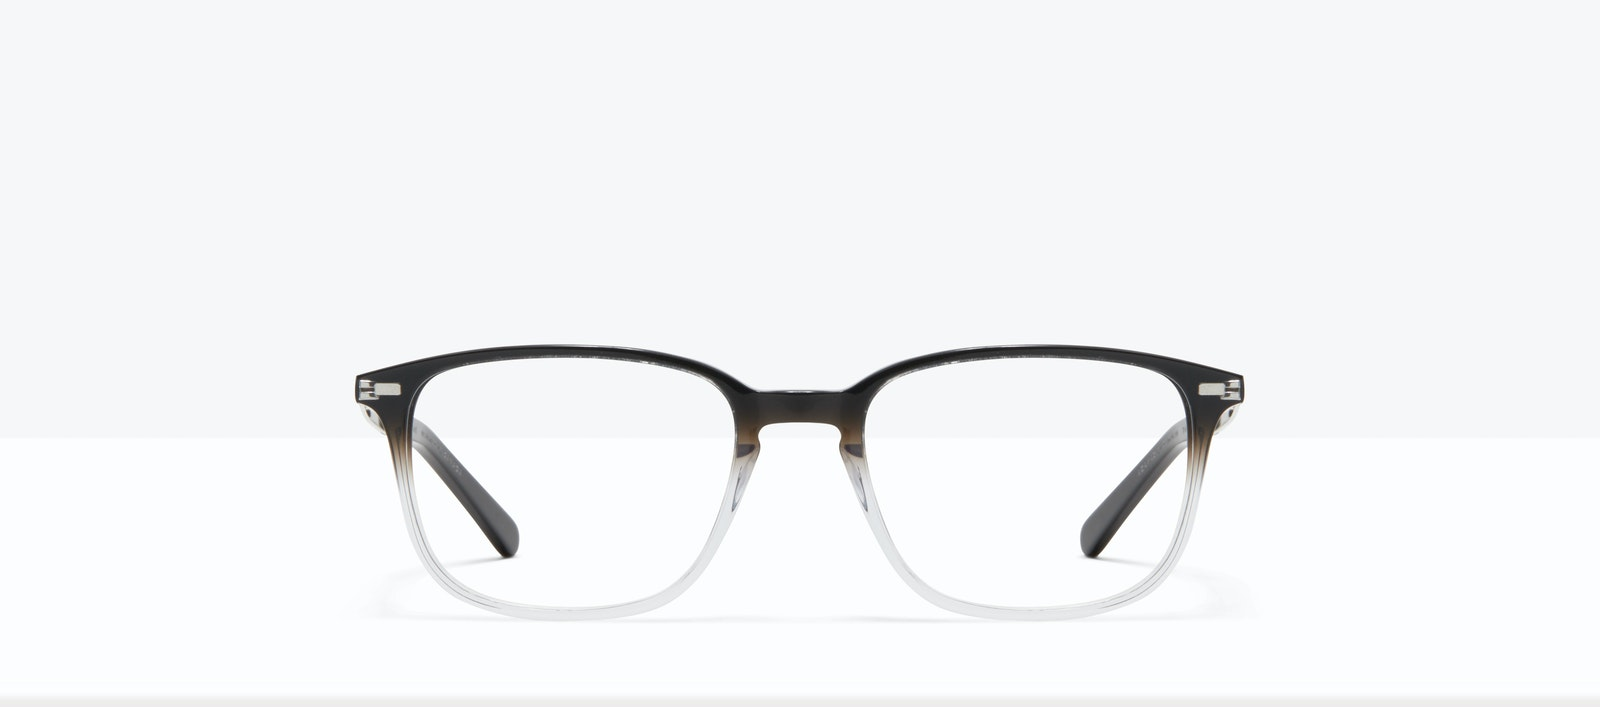 Affordable Fashion Glasses Rectangle Eyeglasses Men Sharp S Onyx Clear Front